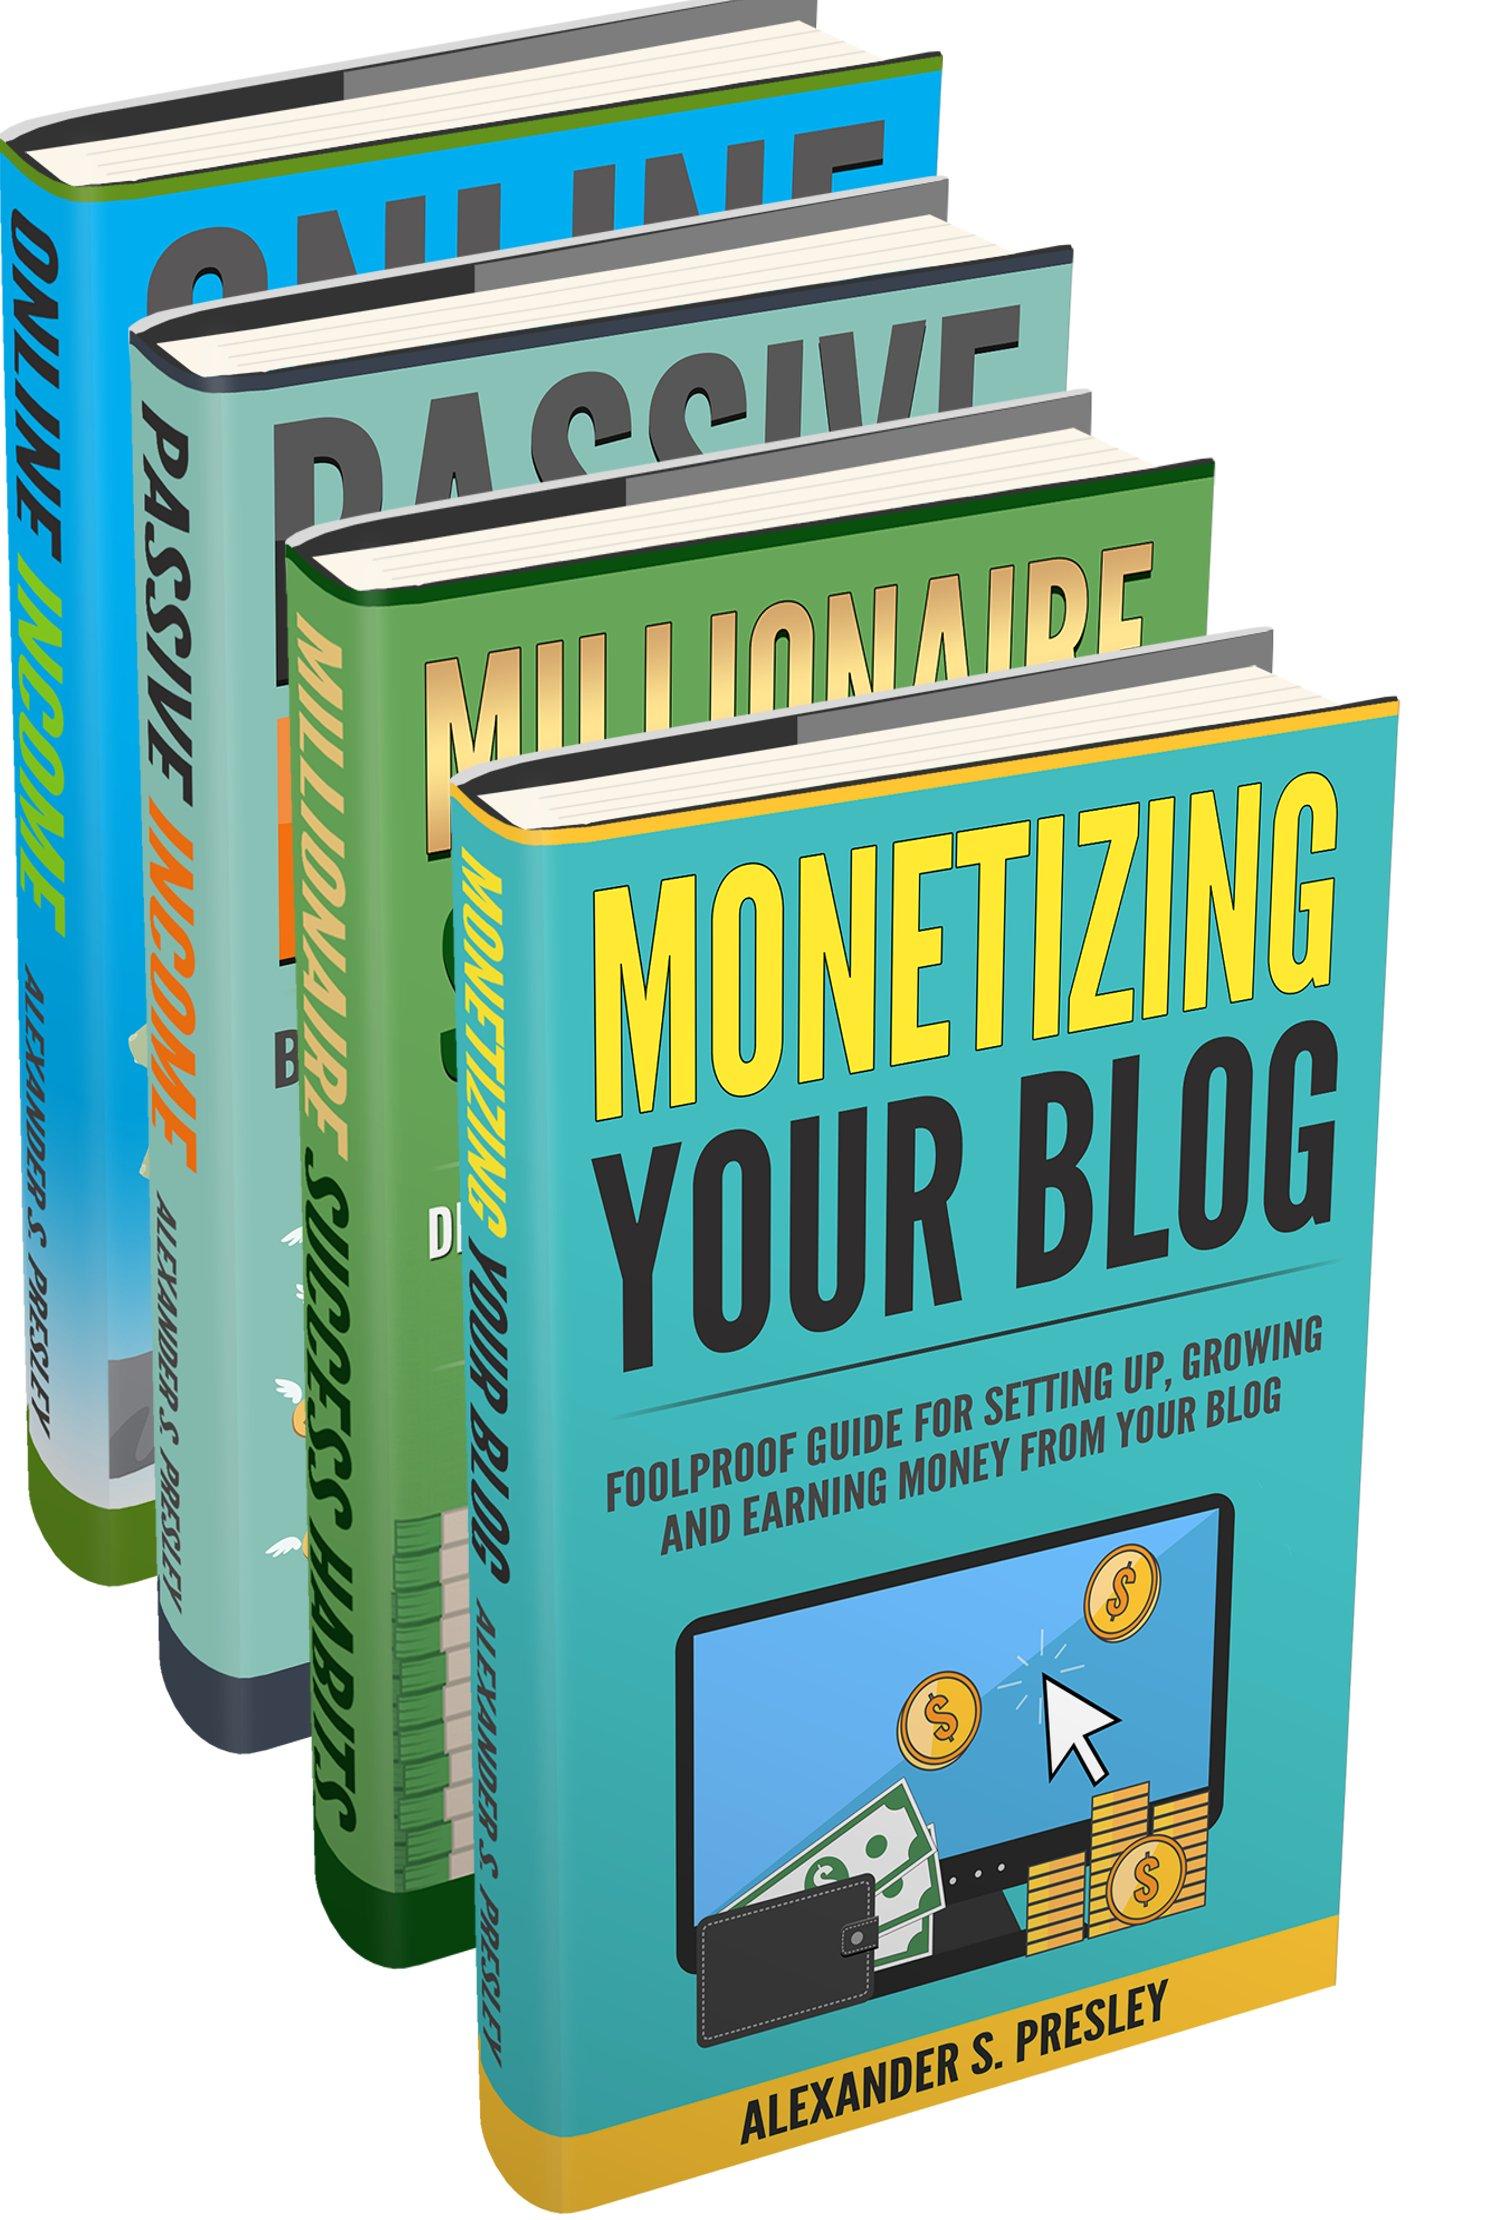 Financial Freedom: Online Income, Passive Income, Millionaire Success Habits, Monetizing Your Blog